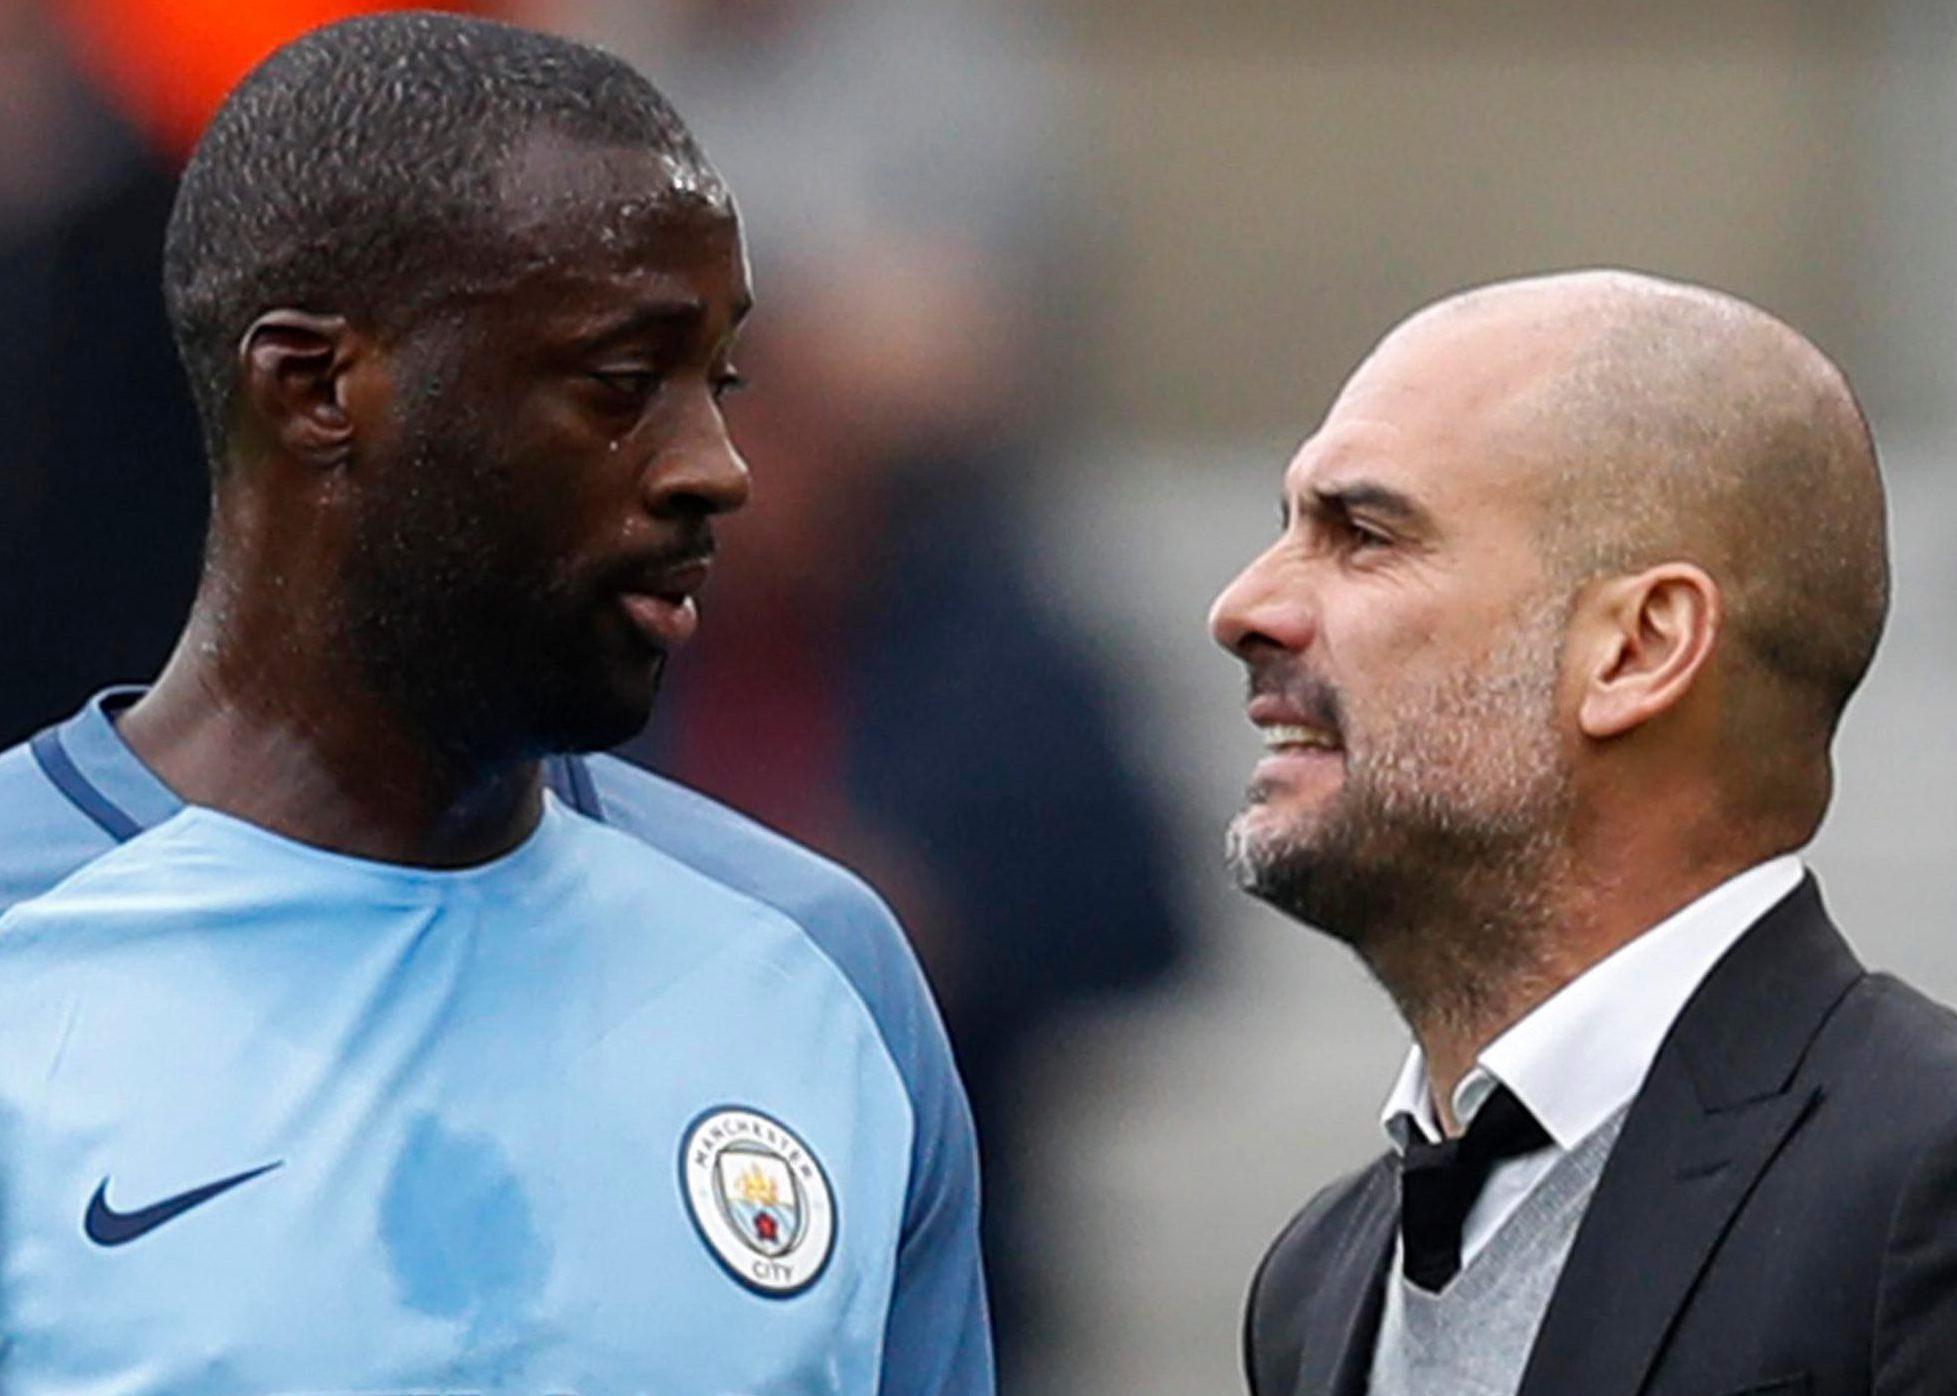 Pep Guardiola and Yaya Toure criticised the Mitre Carabao Cup ball